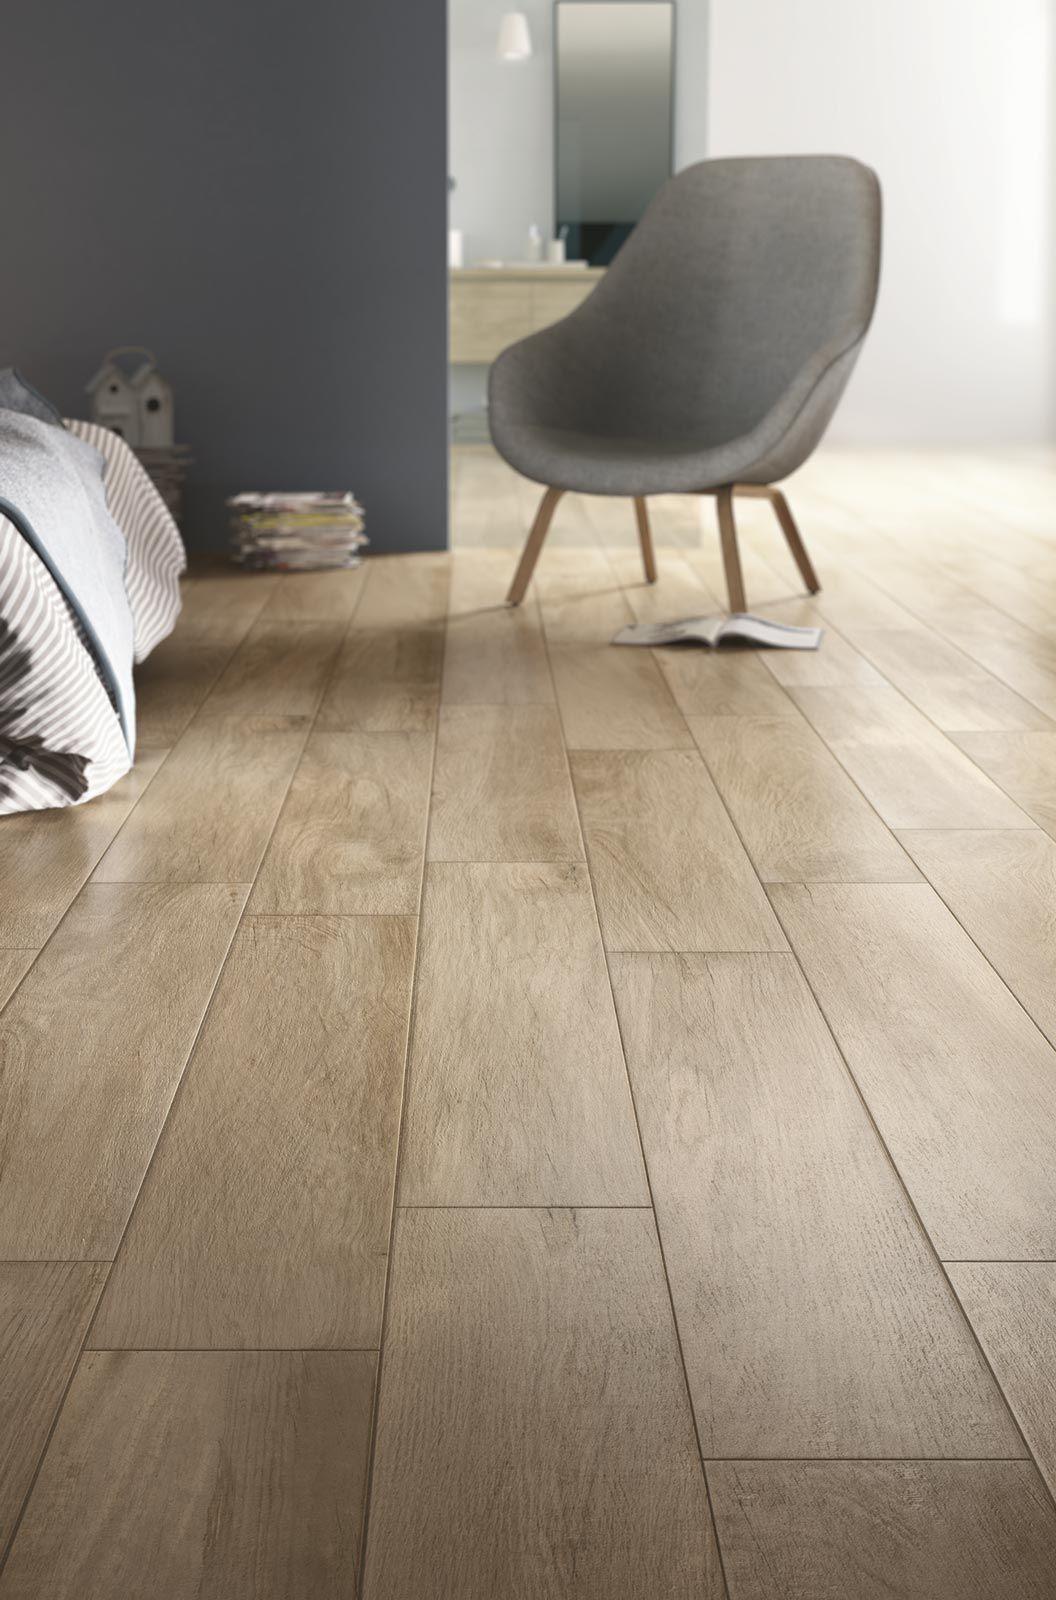 Ragno Woodplace Caramel 20x120 Cm R497 Wood Tile Bedroom Flooring Flooring